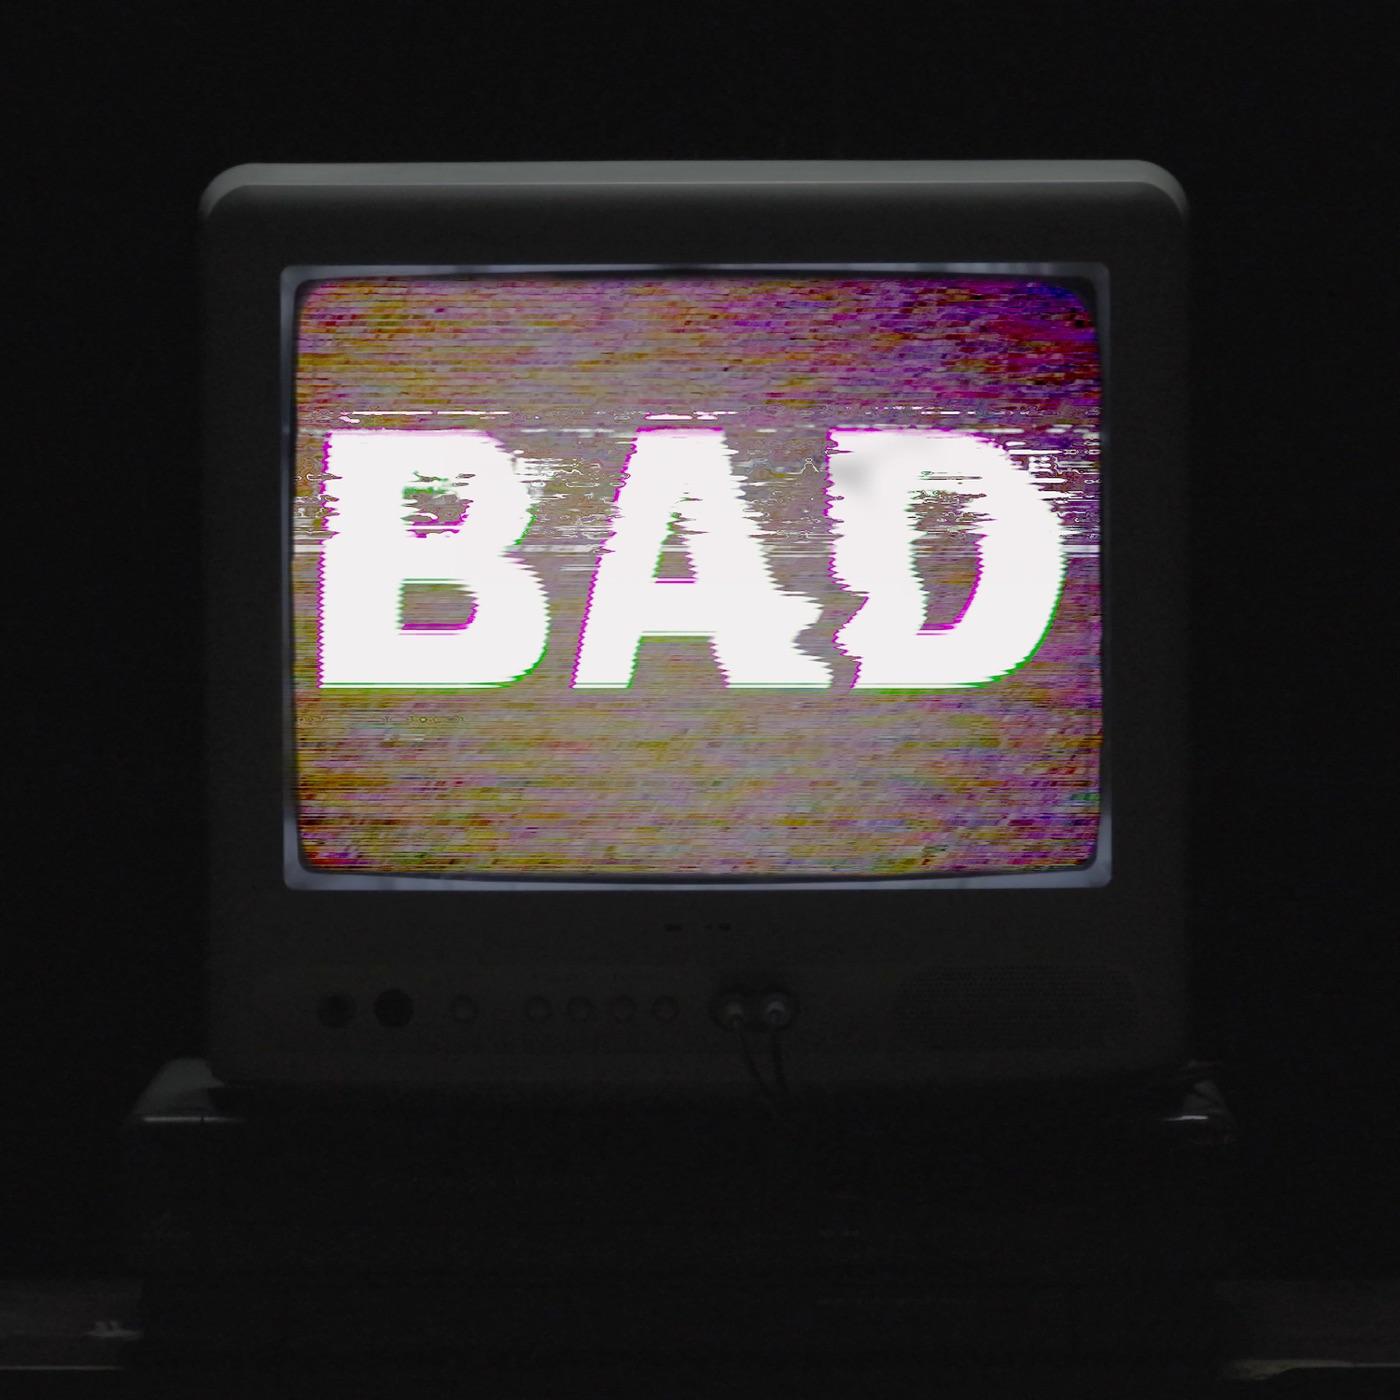 Save Face - Bad [Single] (2018)